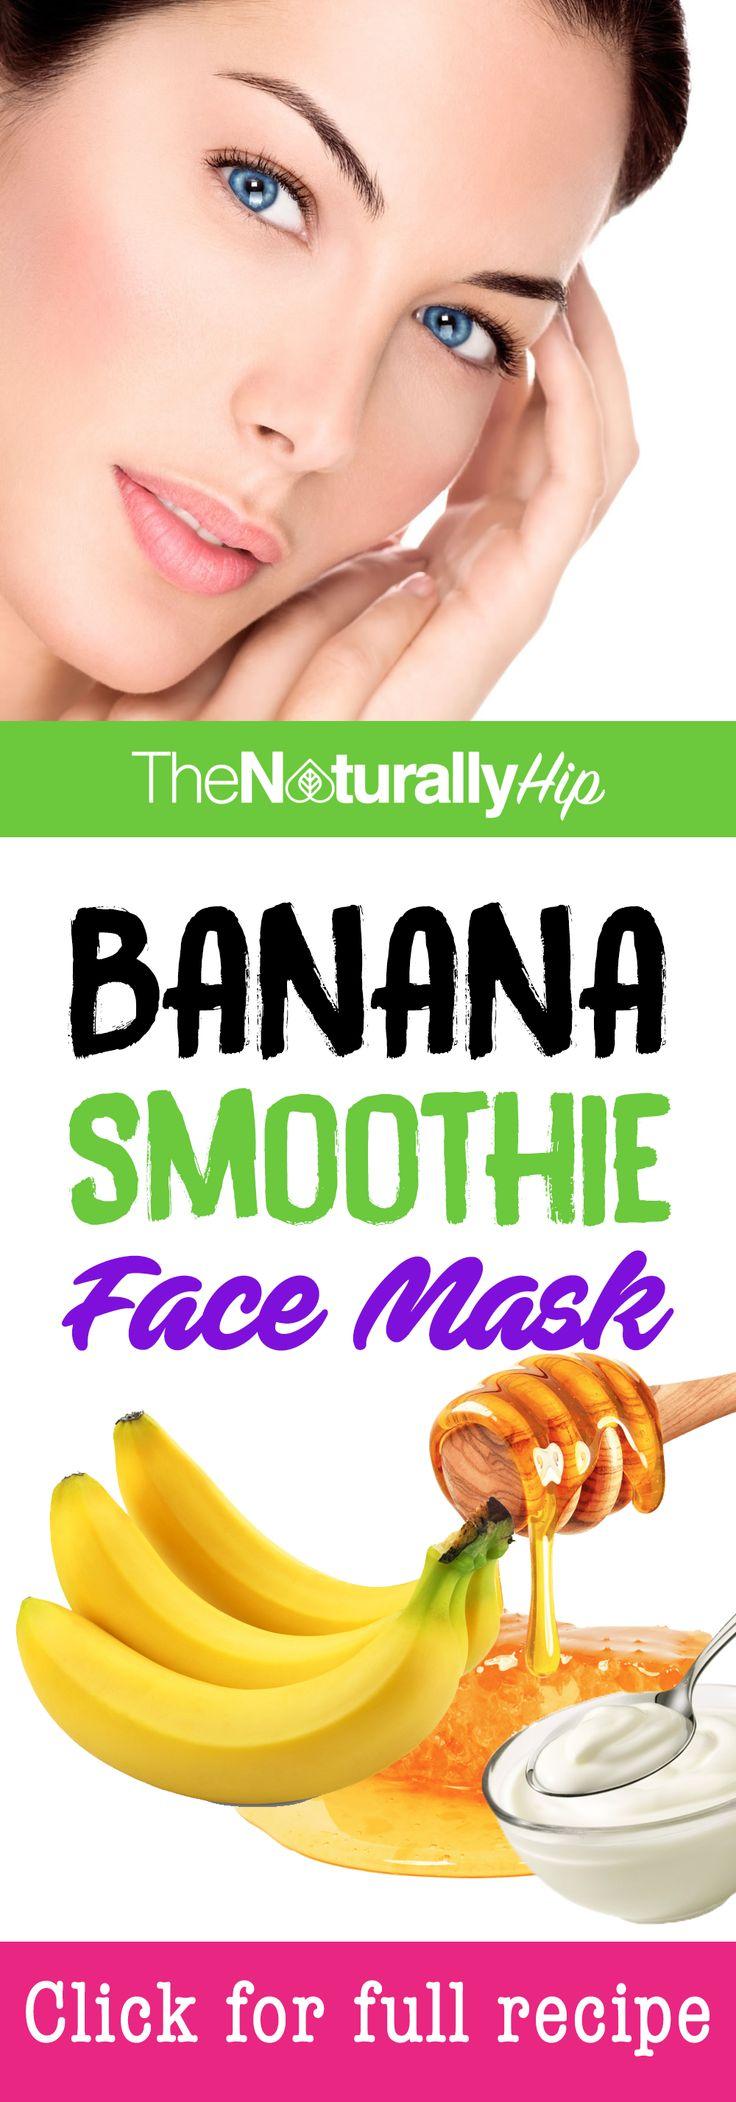 Banana Smoothie Face Mask | Omg I love this mask!